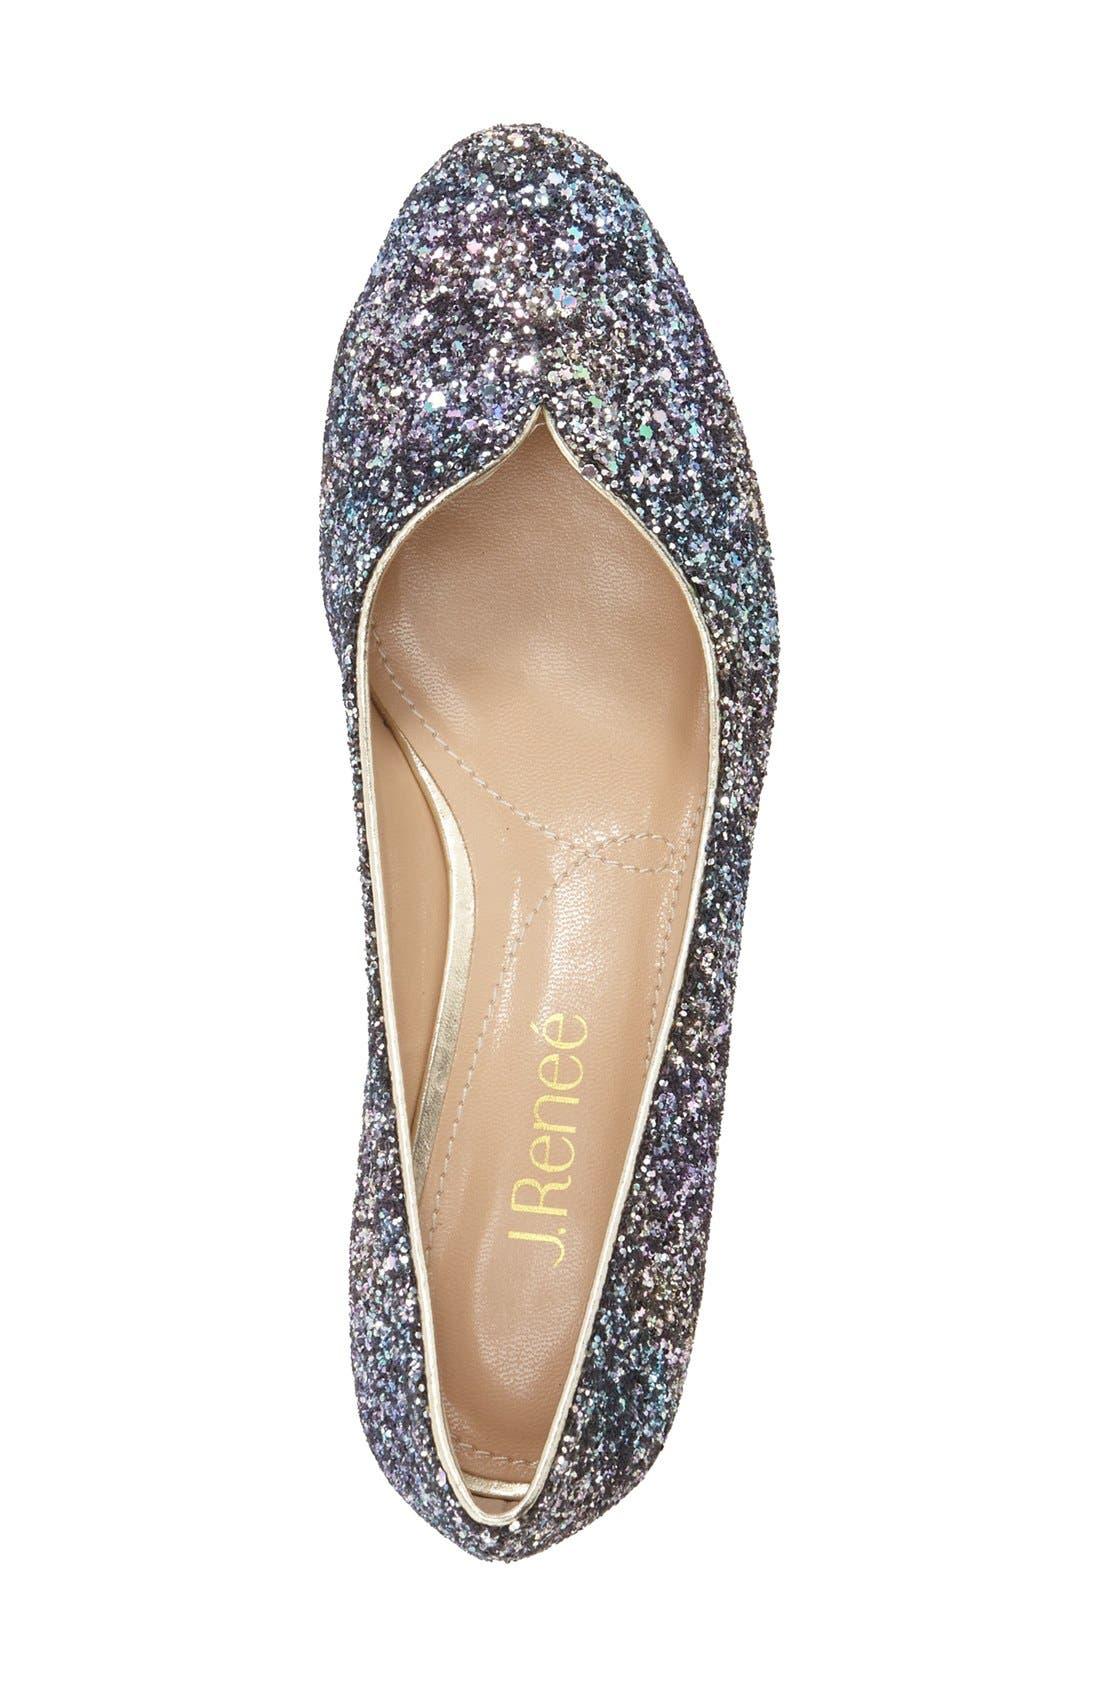 'Bambalina' Block Heel Glitter Pump,                             Alternate thumbnail 3, color,                             Blue/ Gold Glitter Fabric